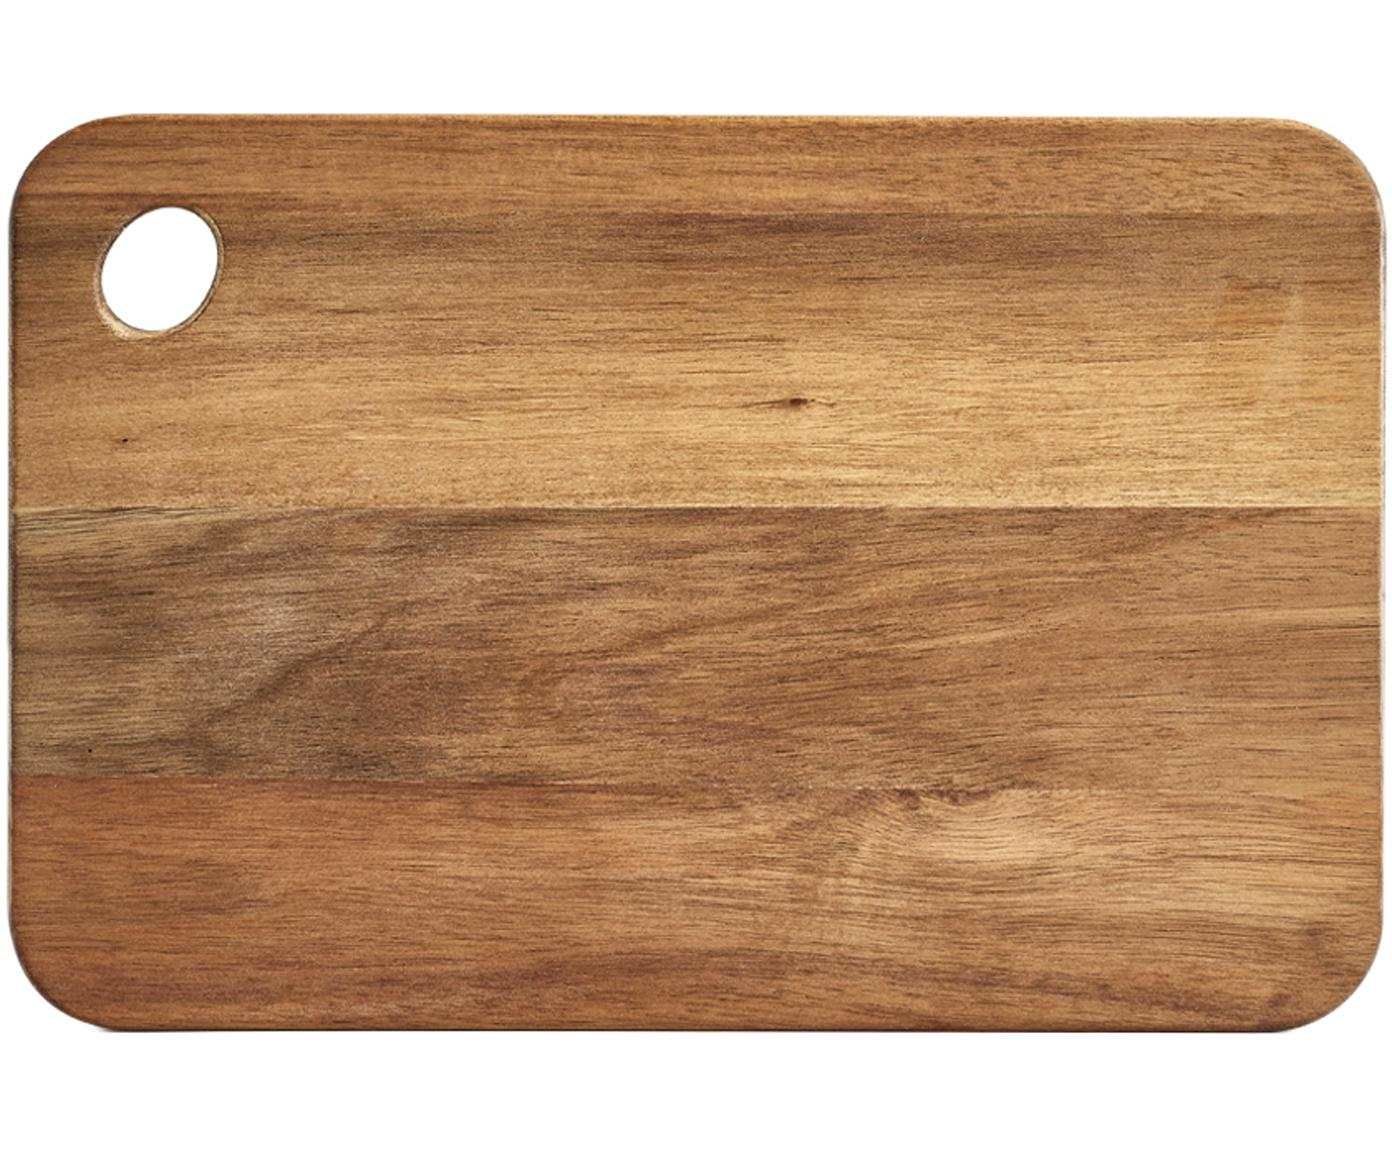 Schneidebrett Akana aus Akazienholz, Akazienholz, geölt, Akazienholz, B 37 x T 25 cm